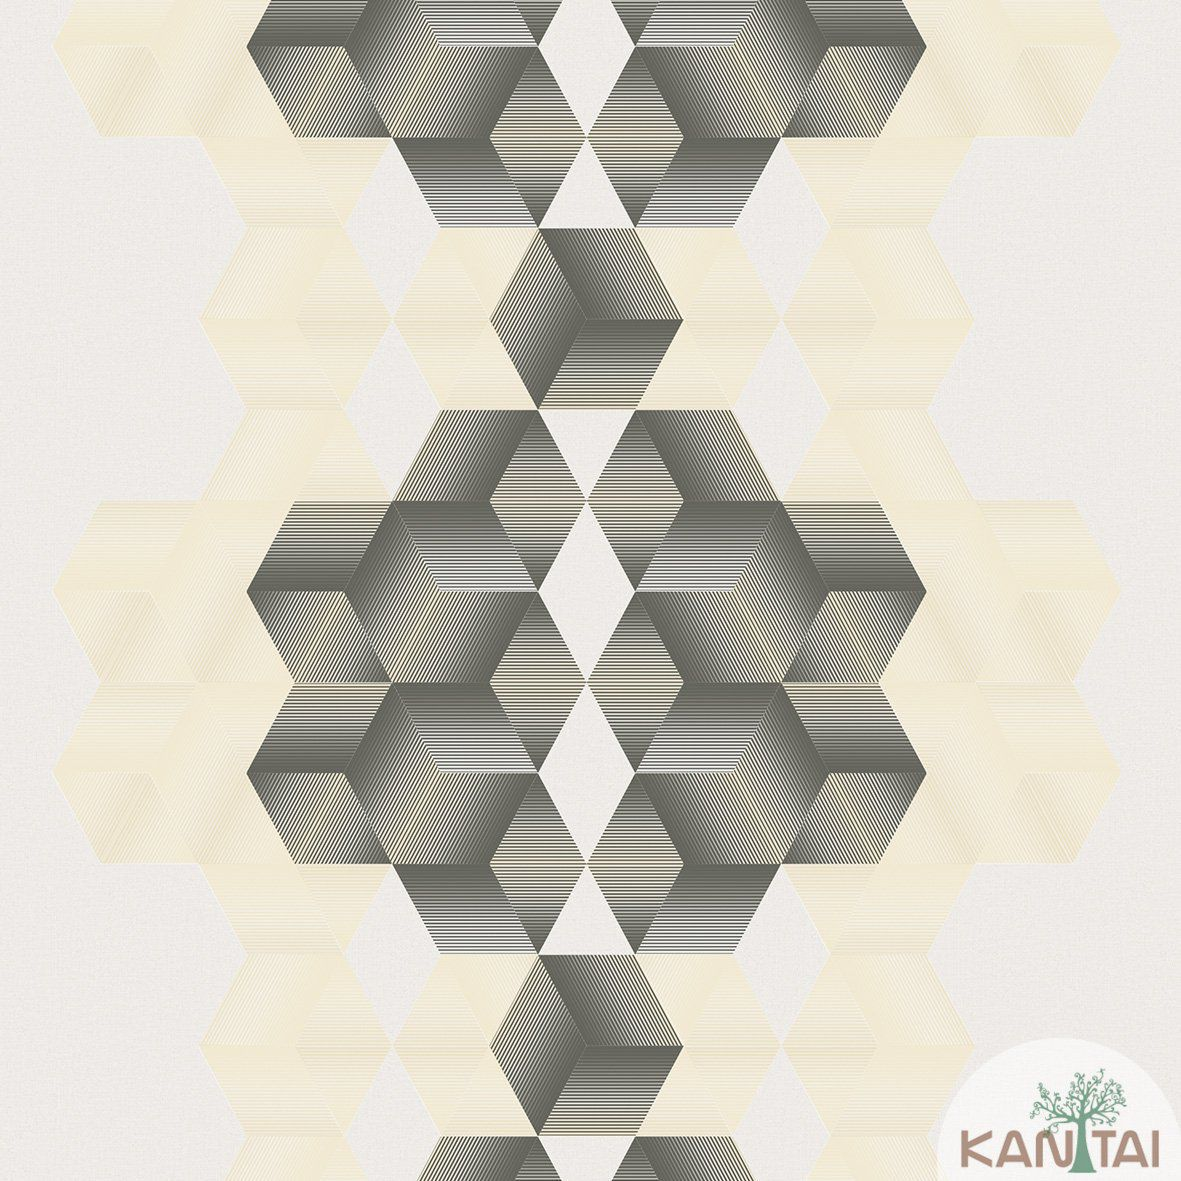 Papel de Parede  Kan Tai Vinilico  Coleção Neonature III 3D Geométrico Bege, Creme, Grafite